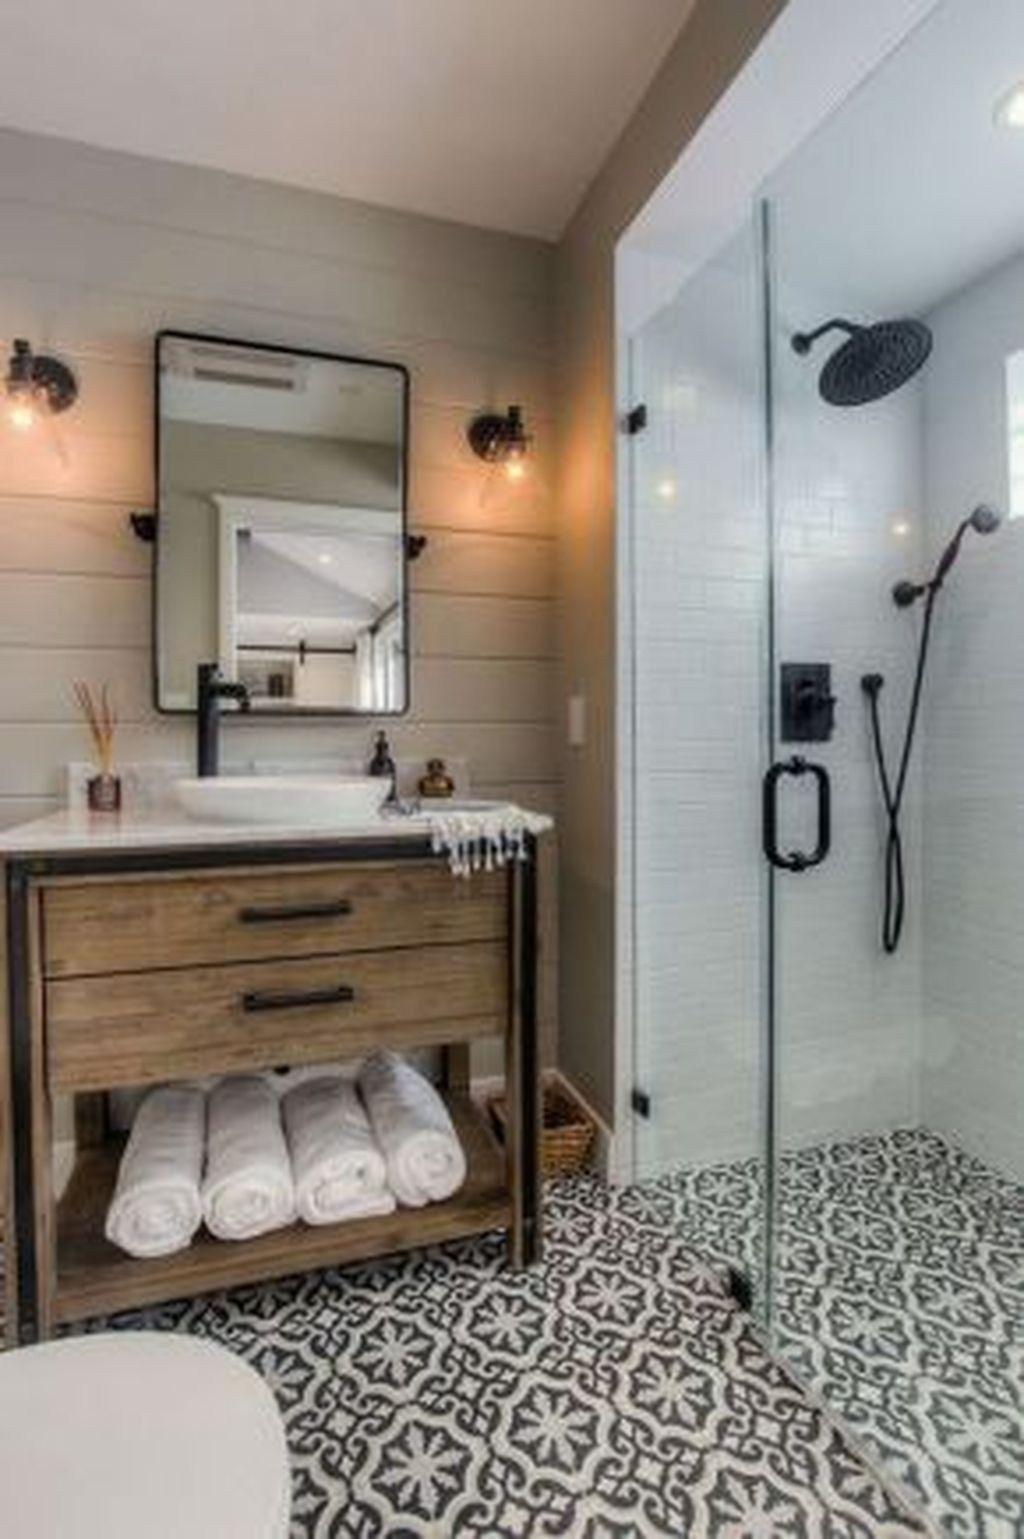 31 stunning farmhouse small bathroom decorating ideas tiny housing rh in pinterest com